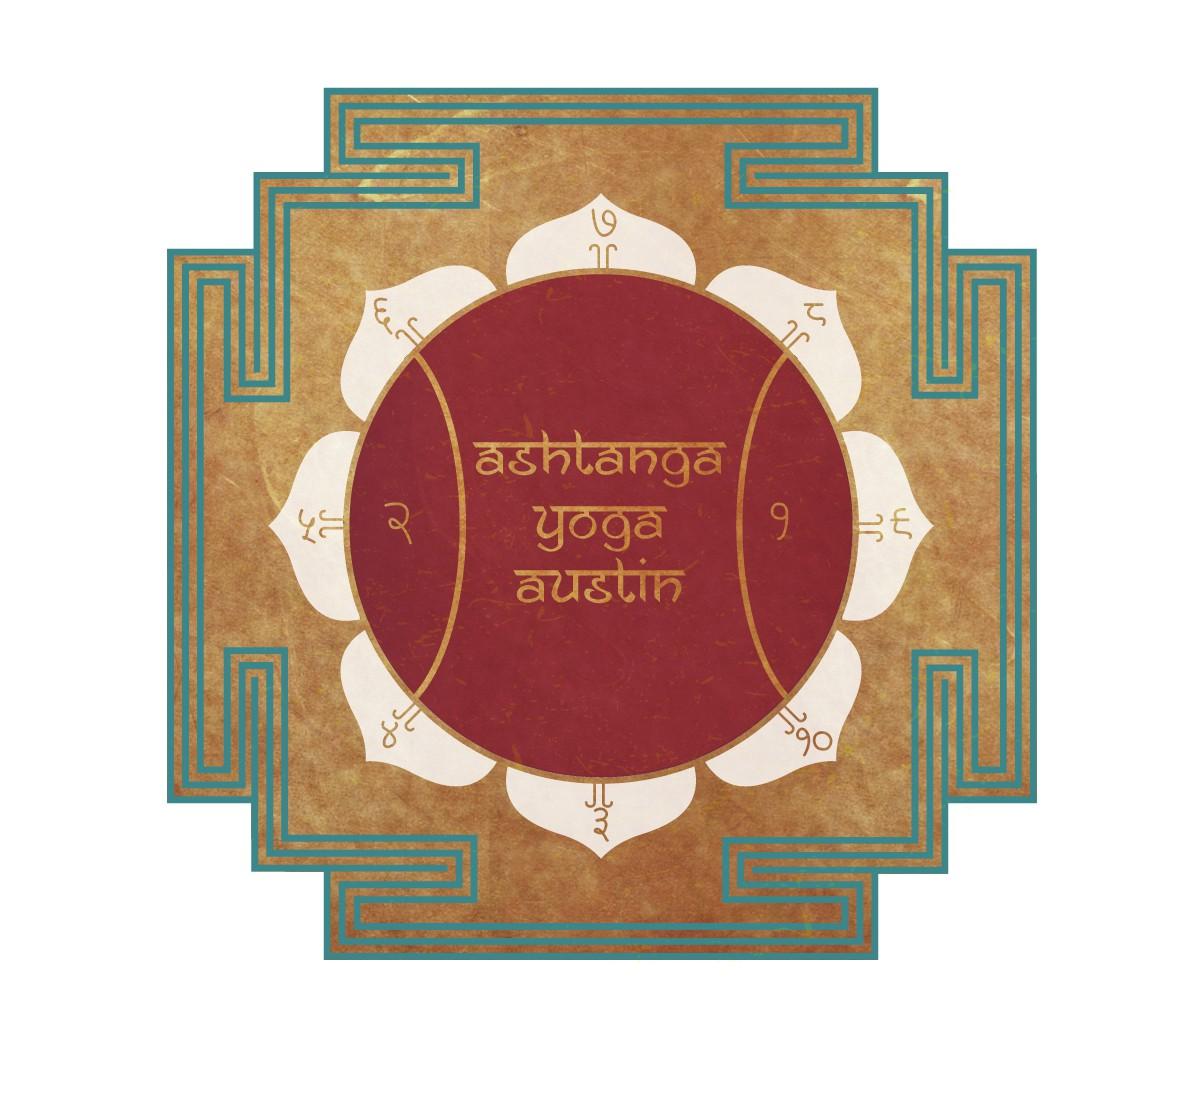 Logo for Ashtanga Yoga Austin